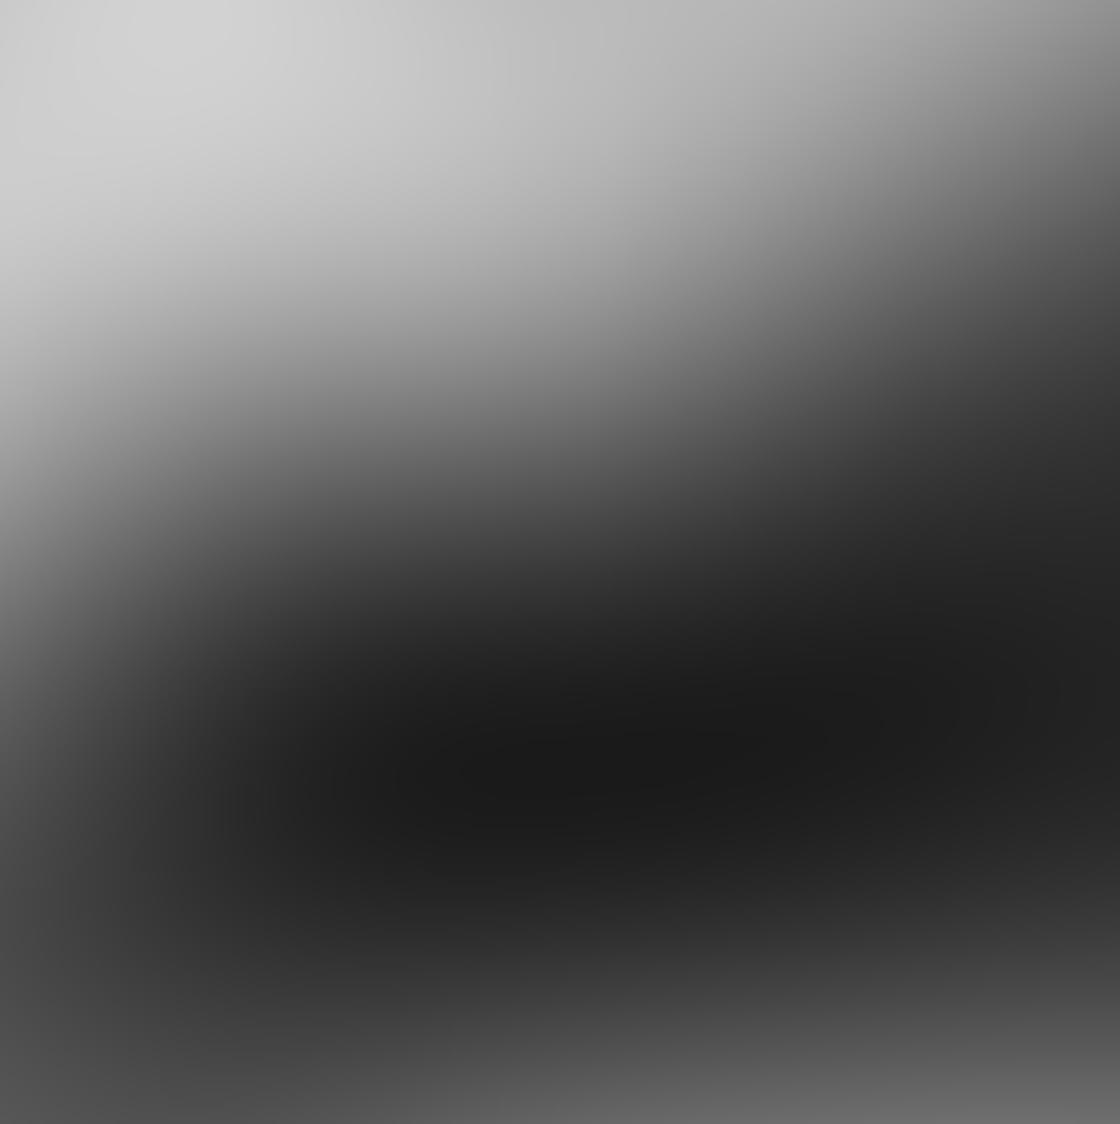 iPhone Photography Light 15